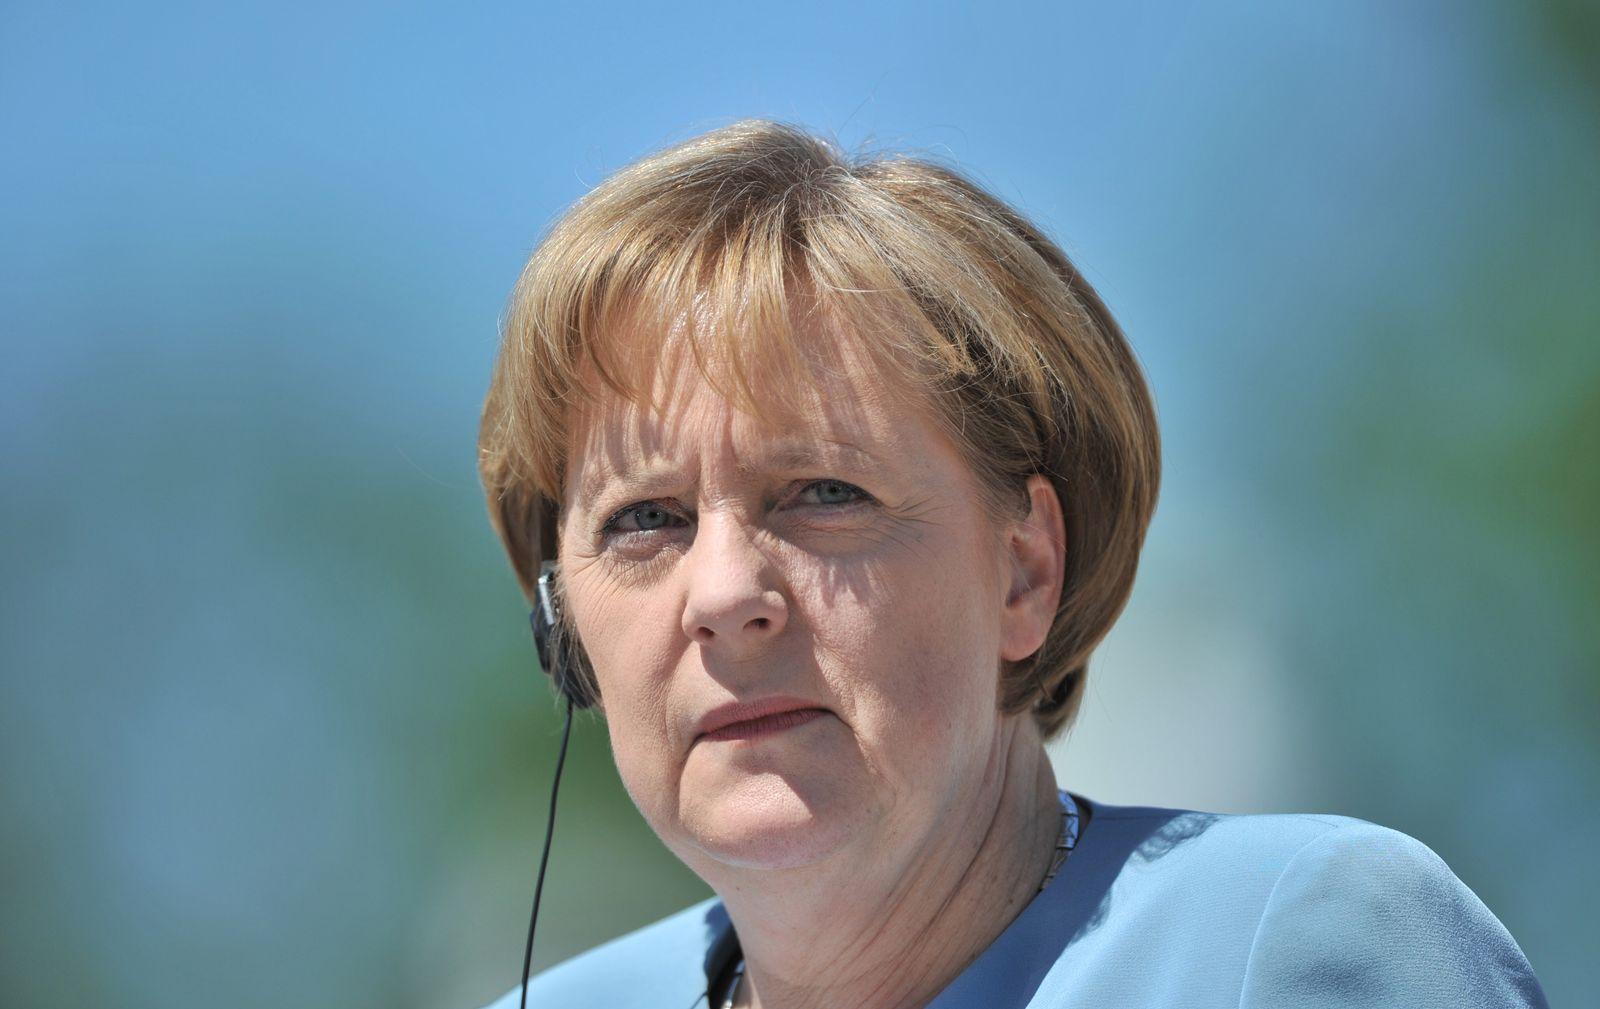 Angela Merkel / Meseberg